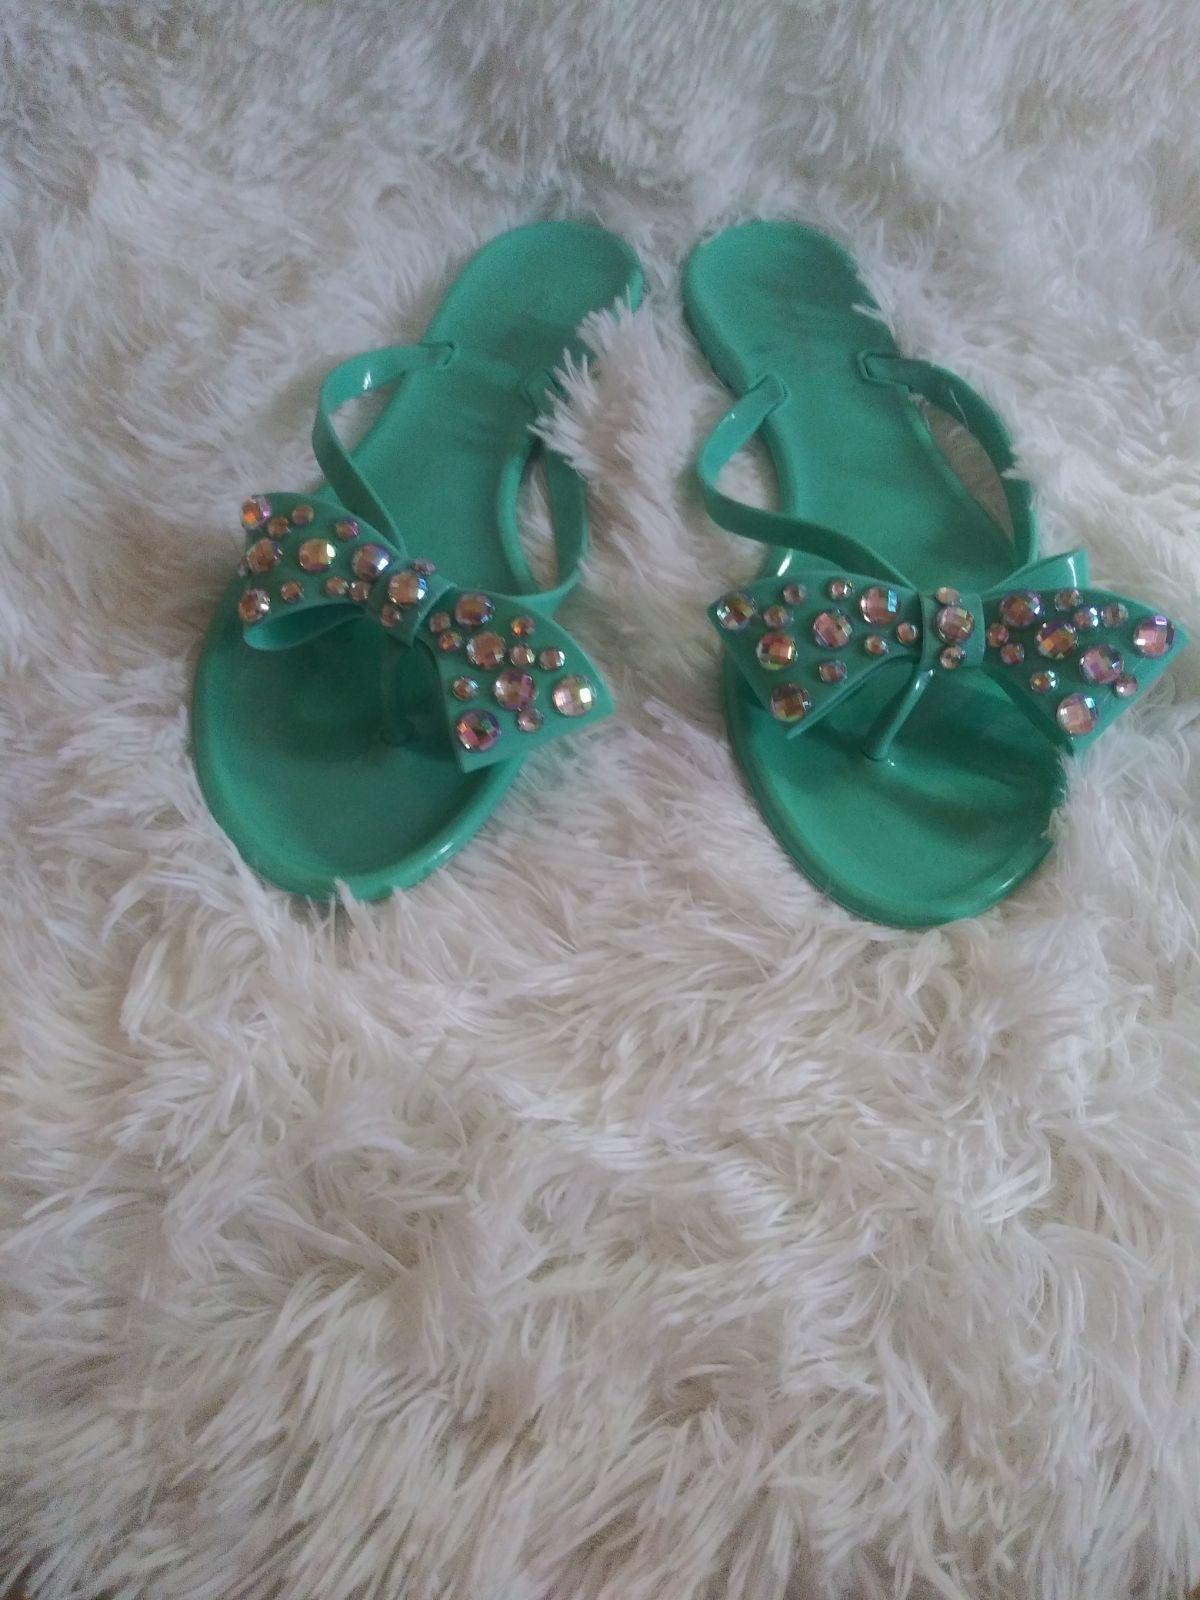 Bow tie sandals